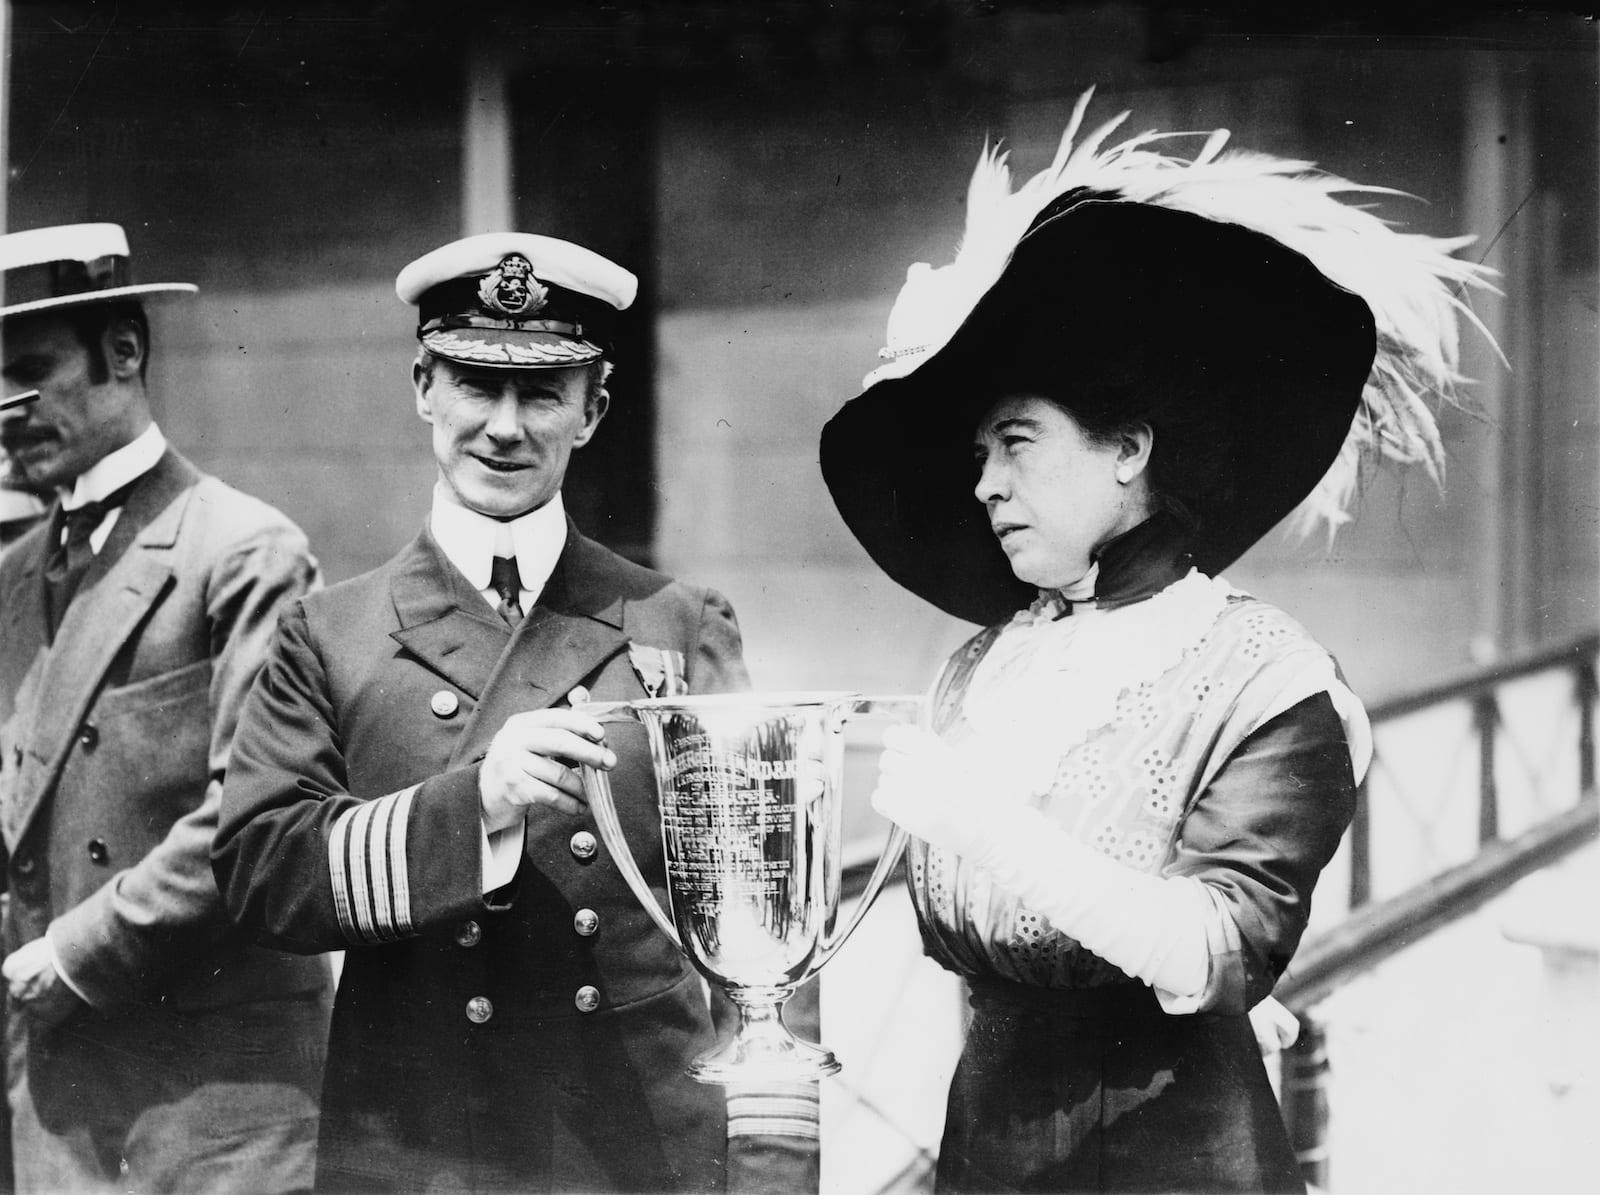 Molly Brown Hands Award to Titanic Captain Arthur Henry Rostron